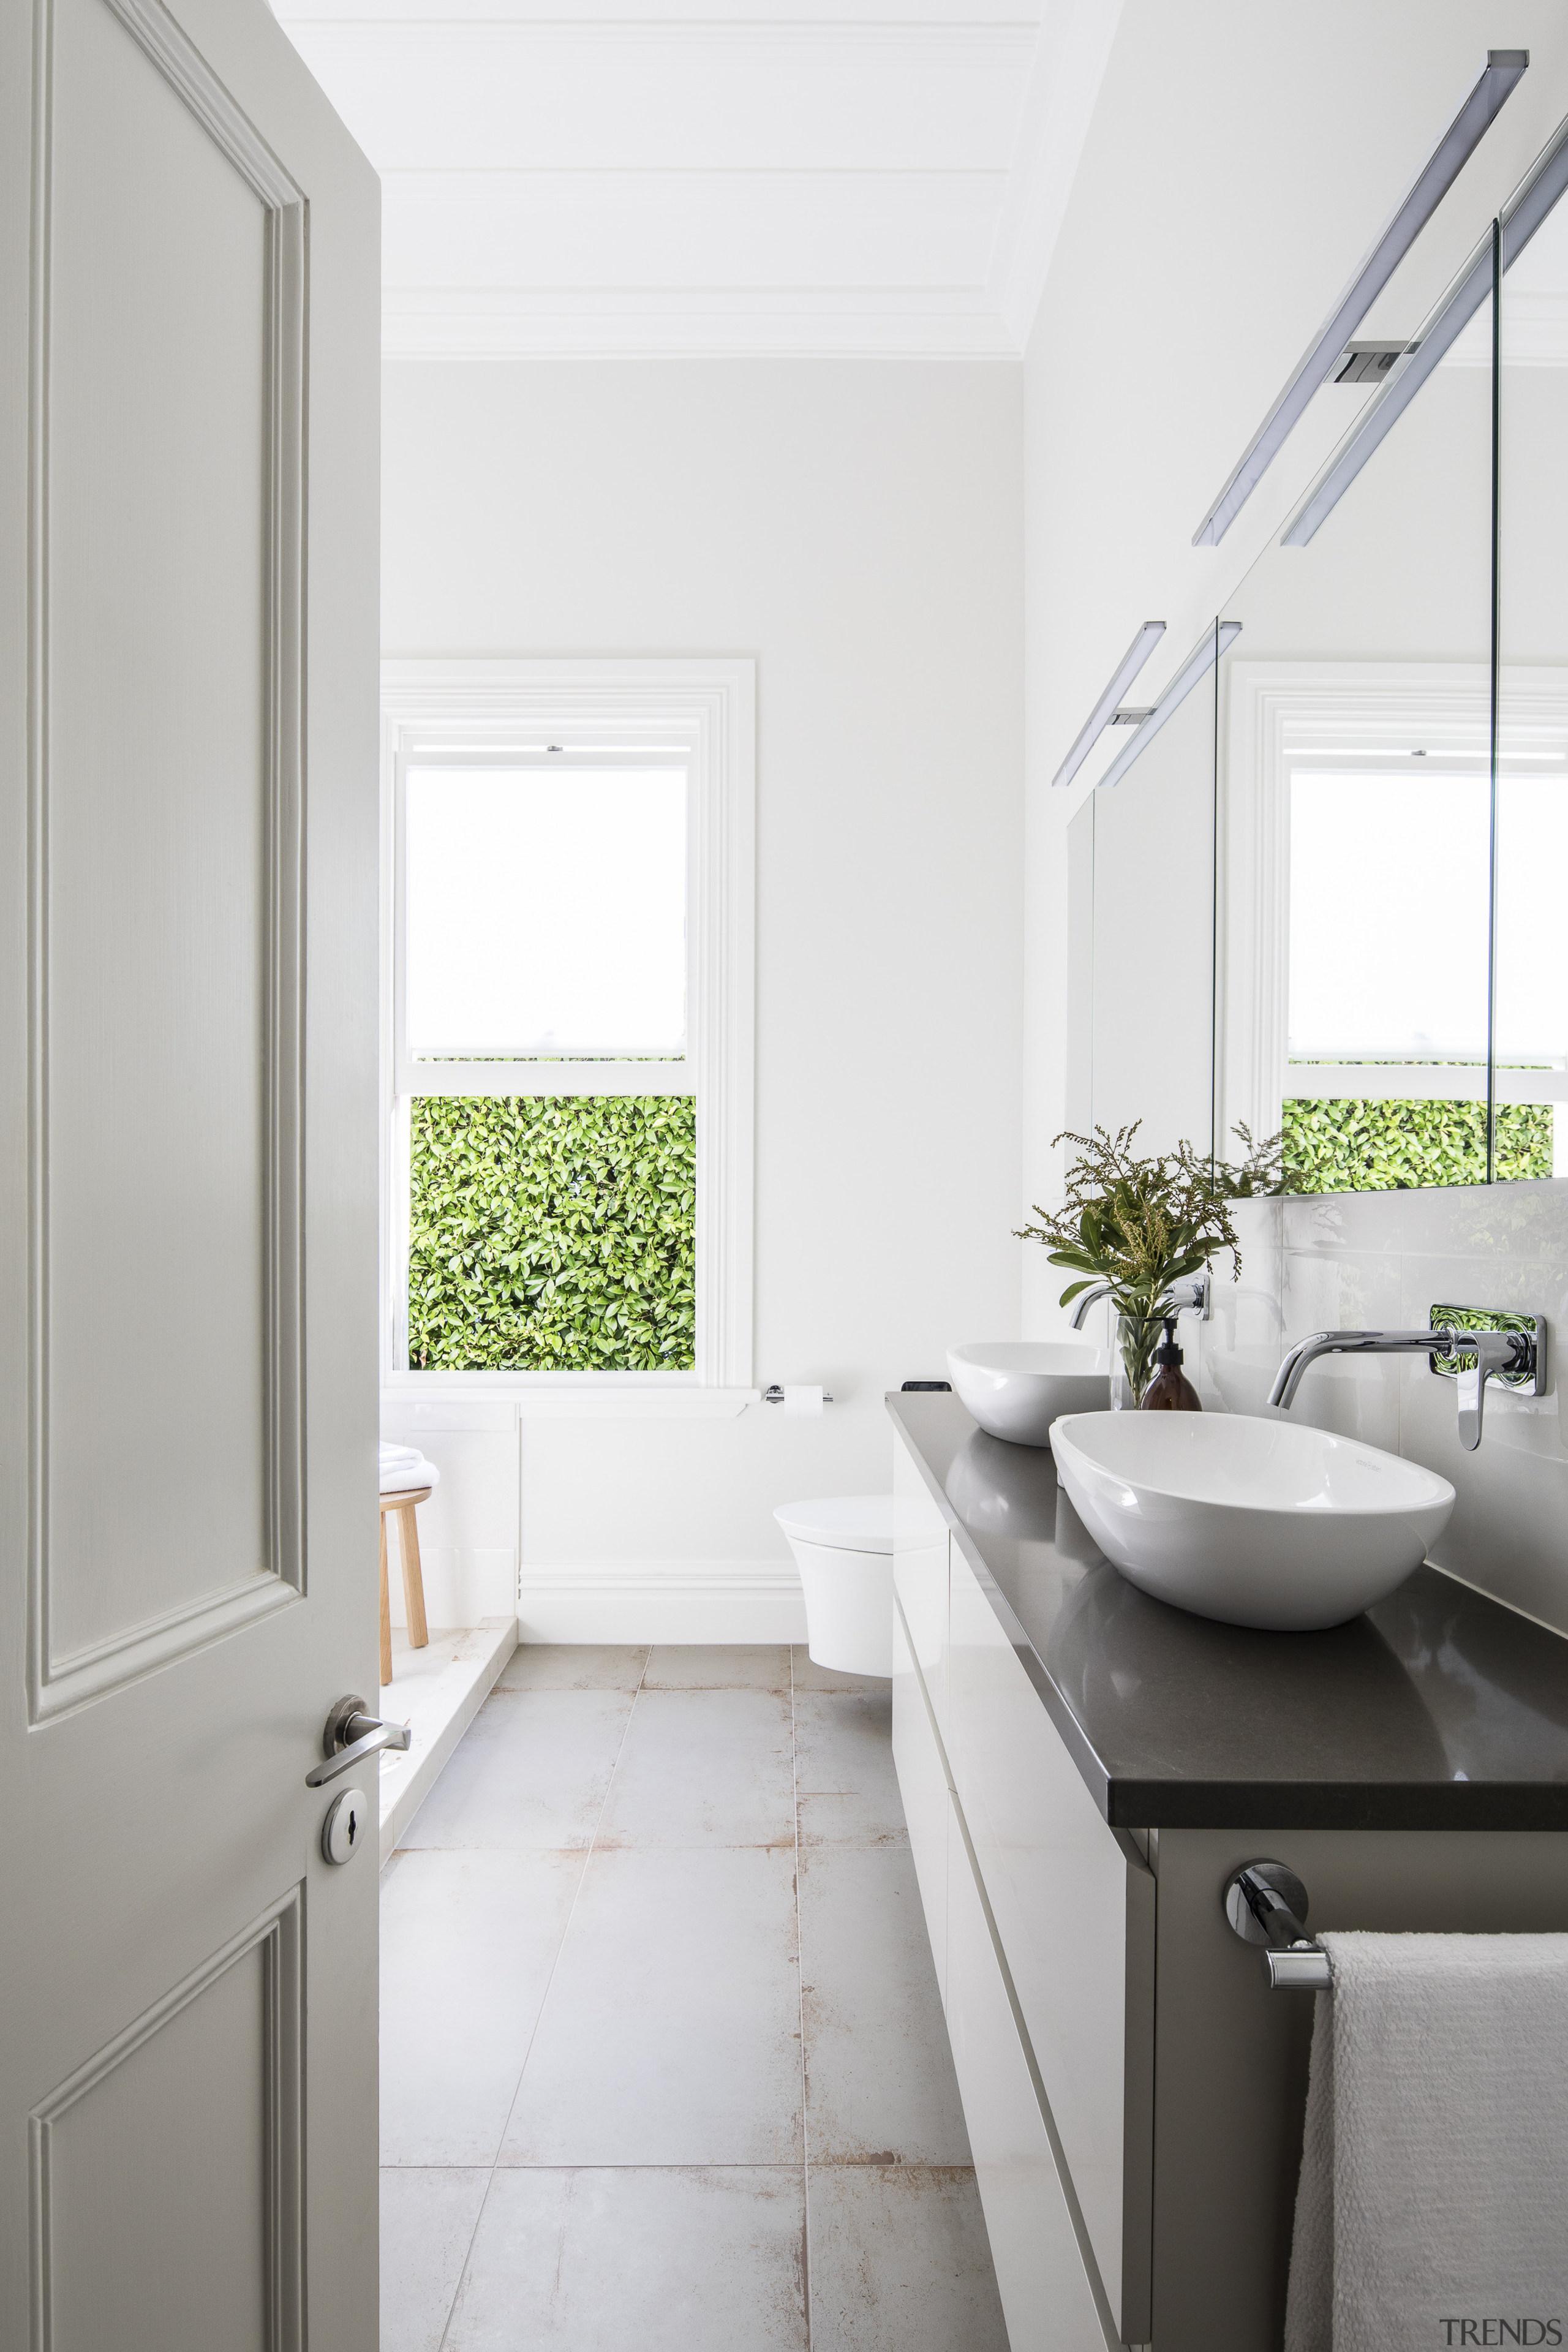 Even from the door, the play between contemporary architecture, bathroom, bathroom accessory, daylighting, floor, home, house, interior design, plumbing fixture, room, sink, tap, window, white